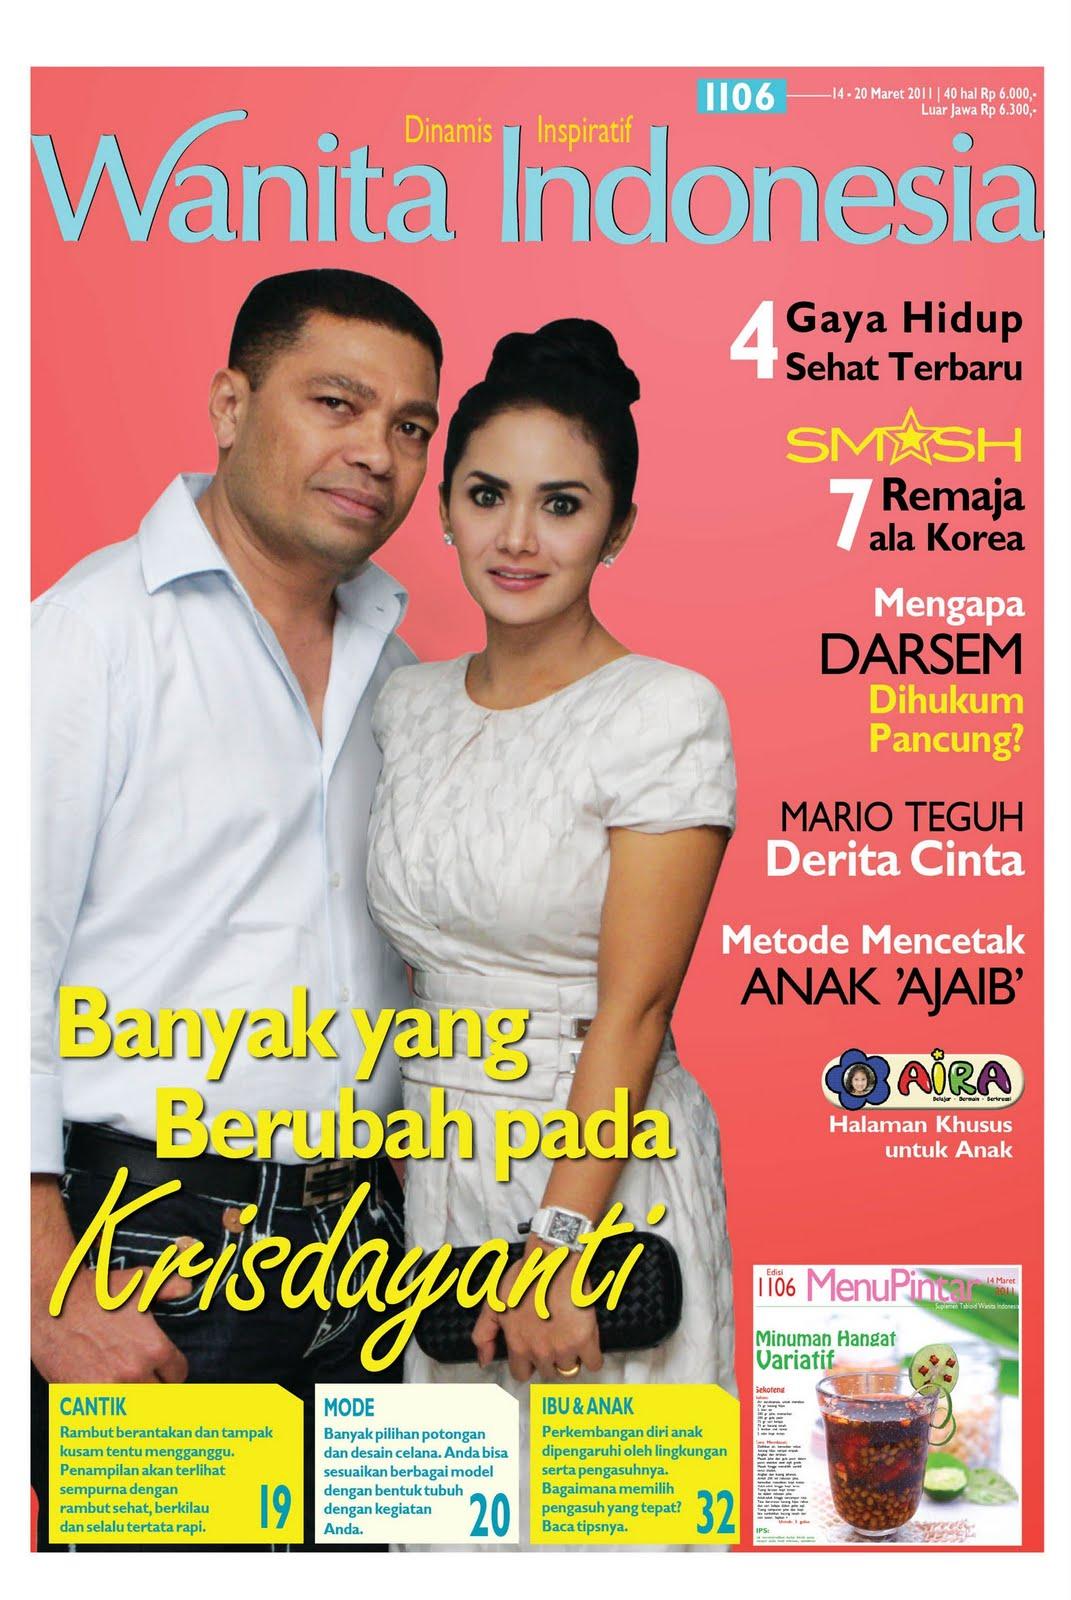 tabloid wanita indonesia tabloid wanita indonesia edisi 1106